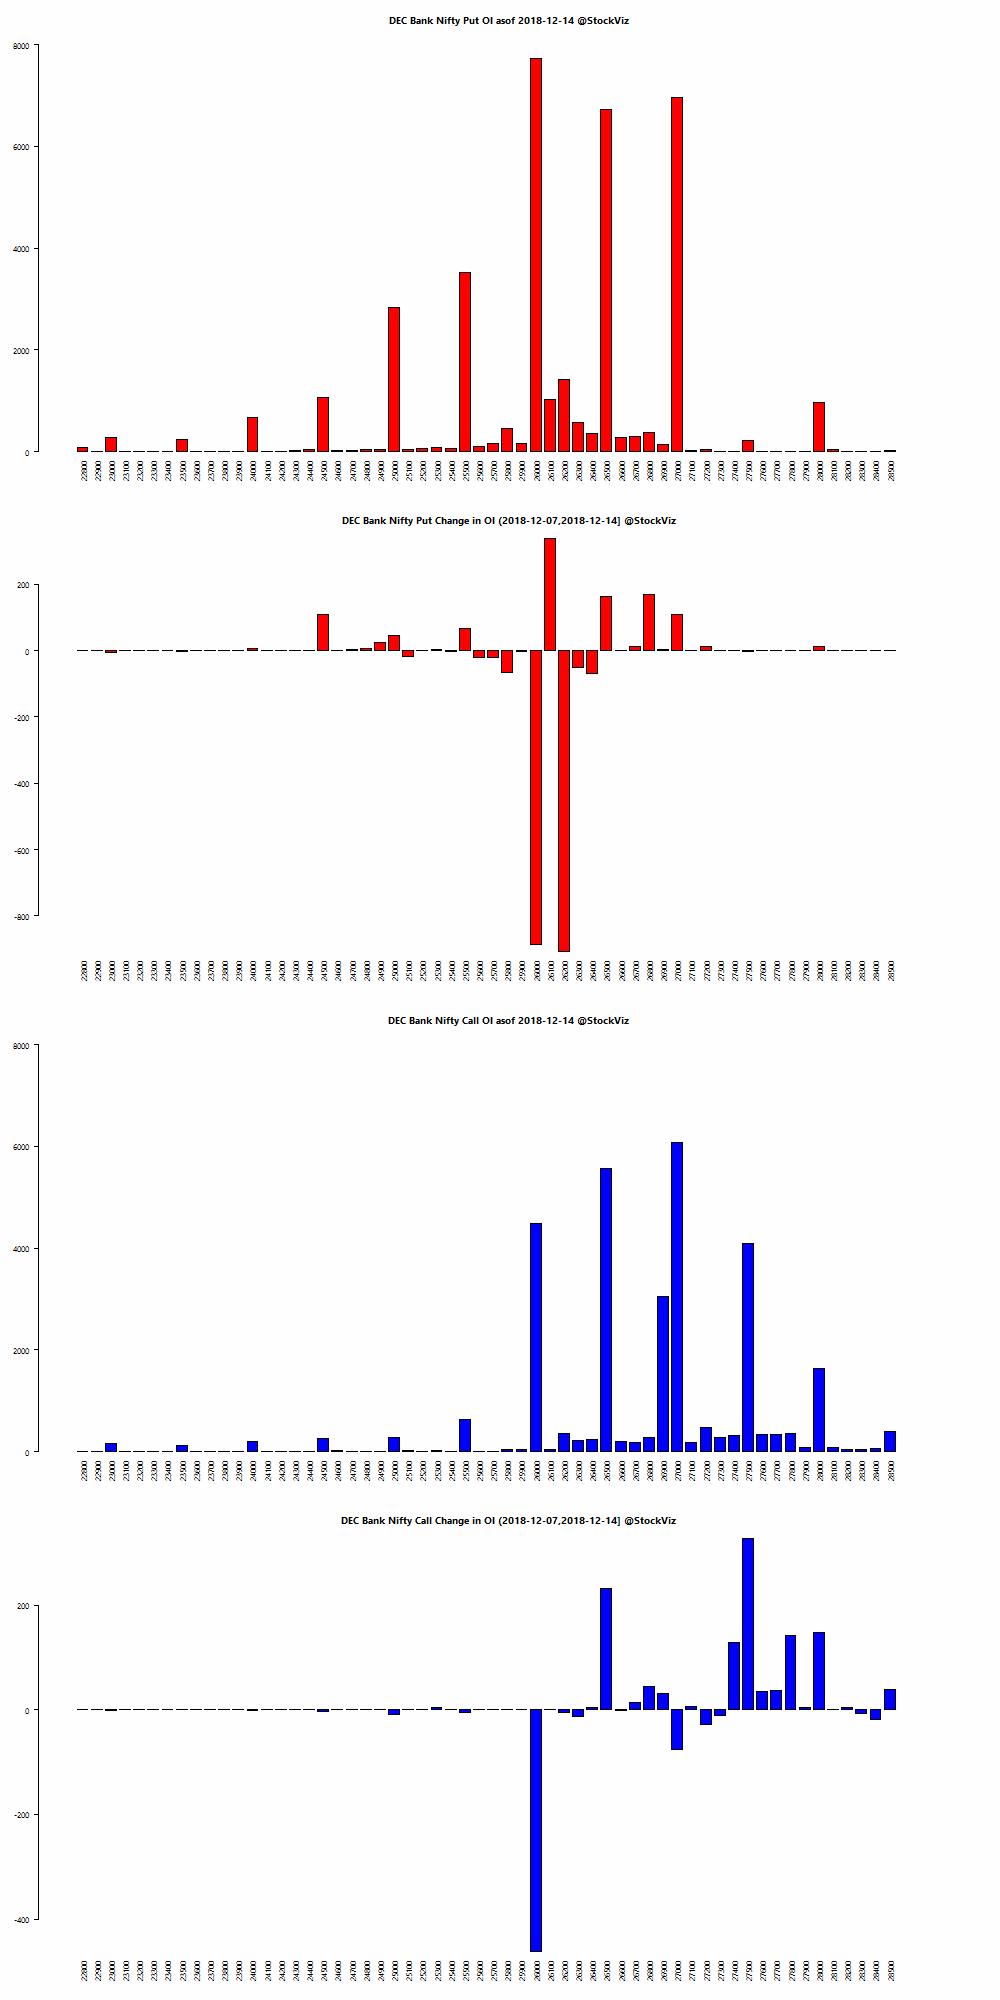 DEC BANKNIFTY OI chart